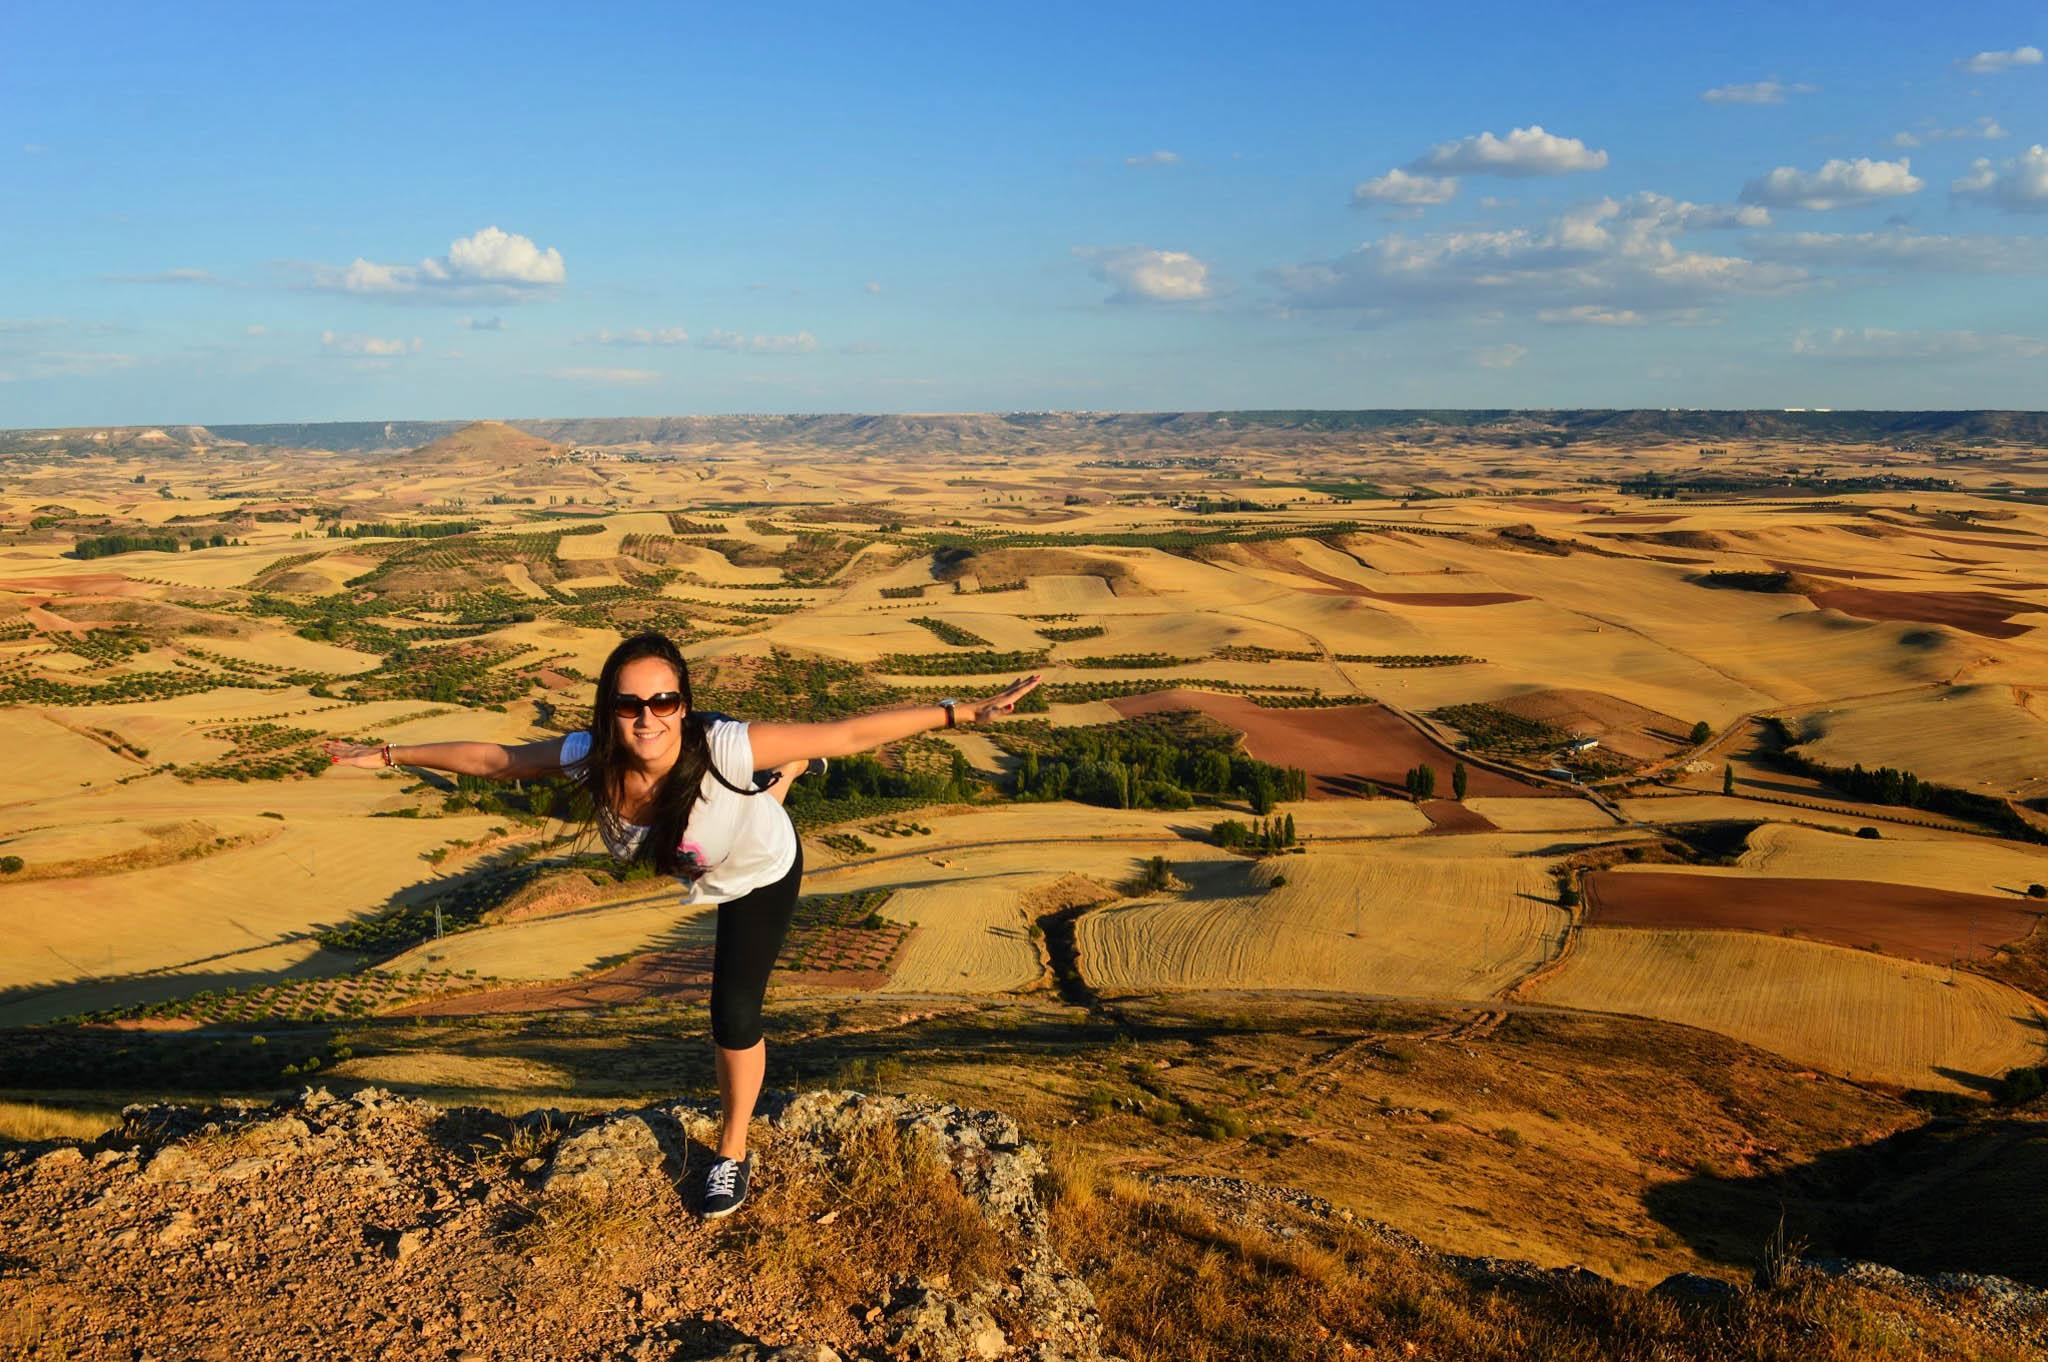 Entrevista a Lorena Palomar del blog La Ratona Viajera